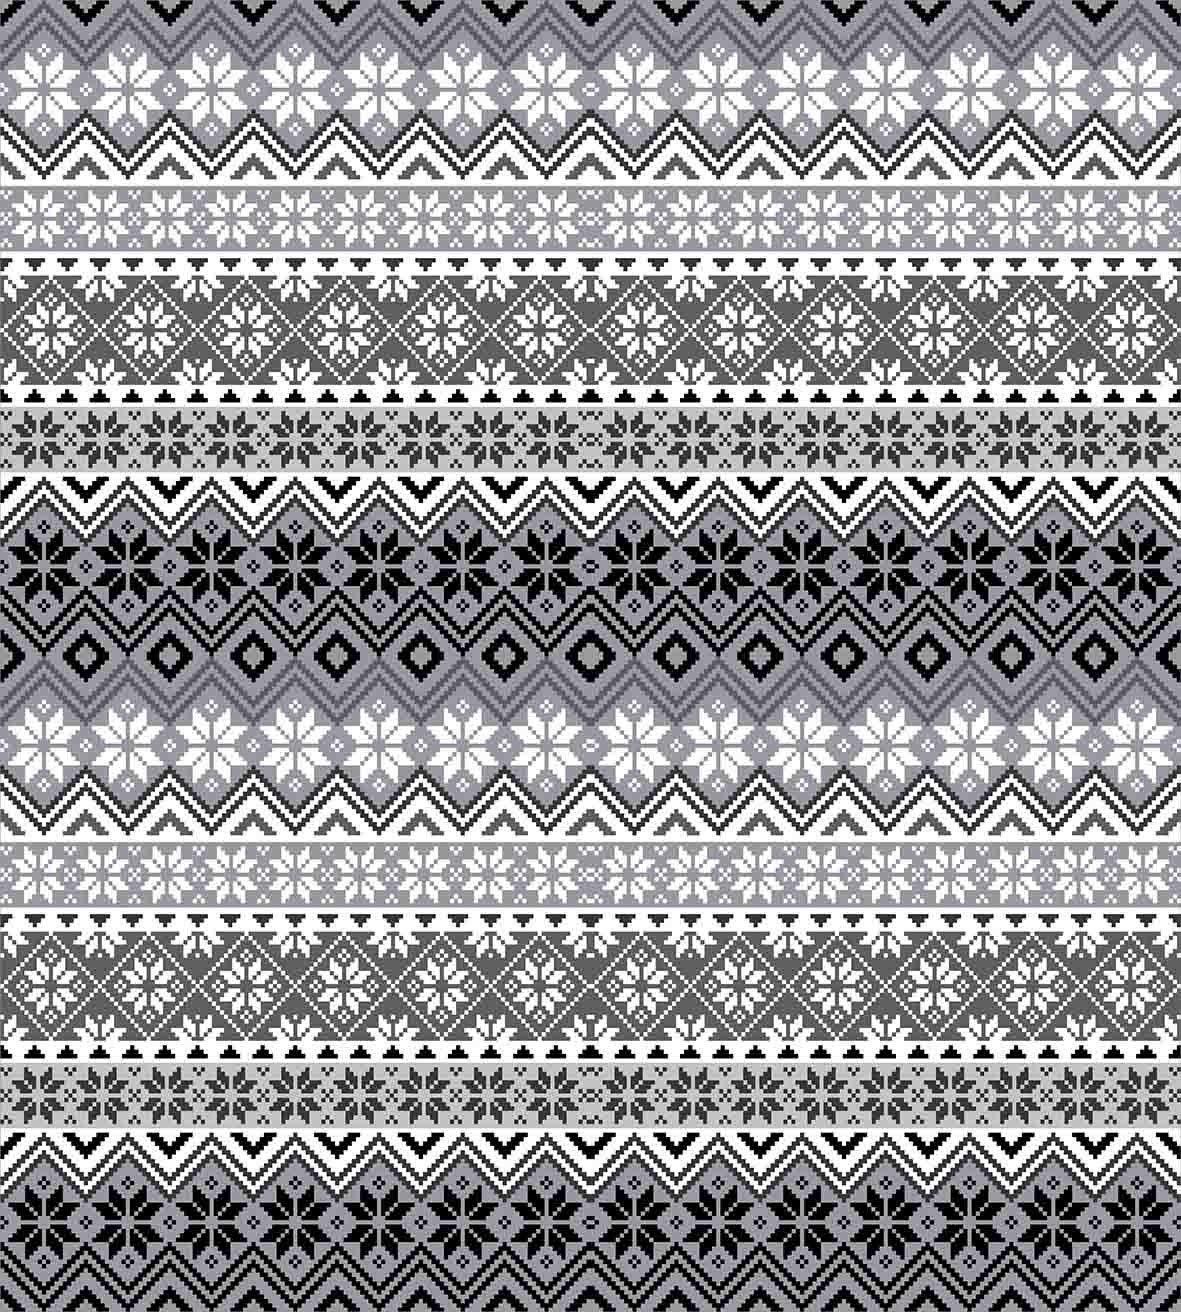 Nordic Snowflake Pattern Scandinavian Style Traditional and Modern Print Home Decor All Season Duvet Cover Bed Set Gray White Black Grey 4 Pcs Bedding Set Twin Size